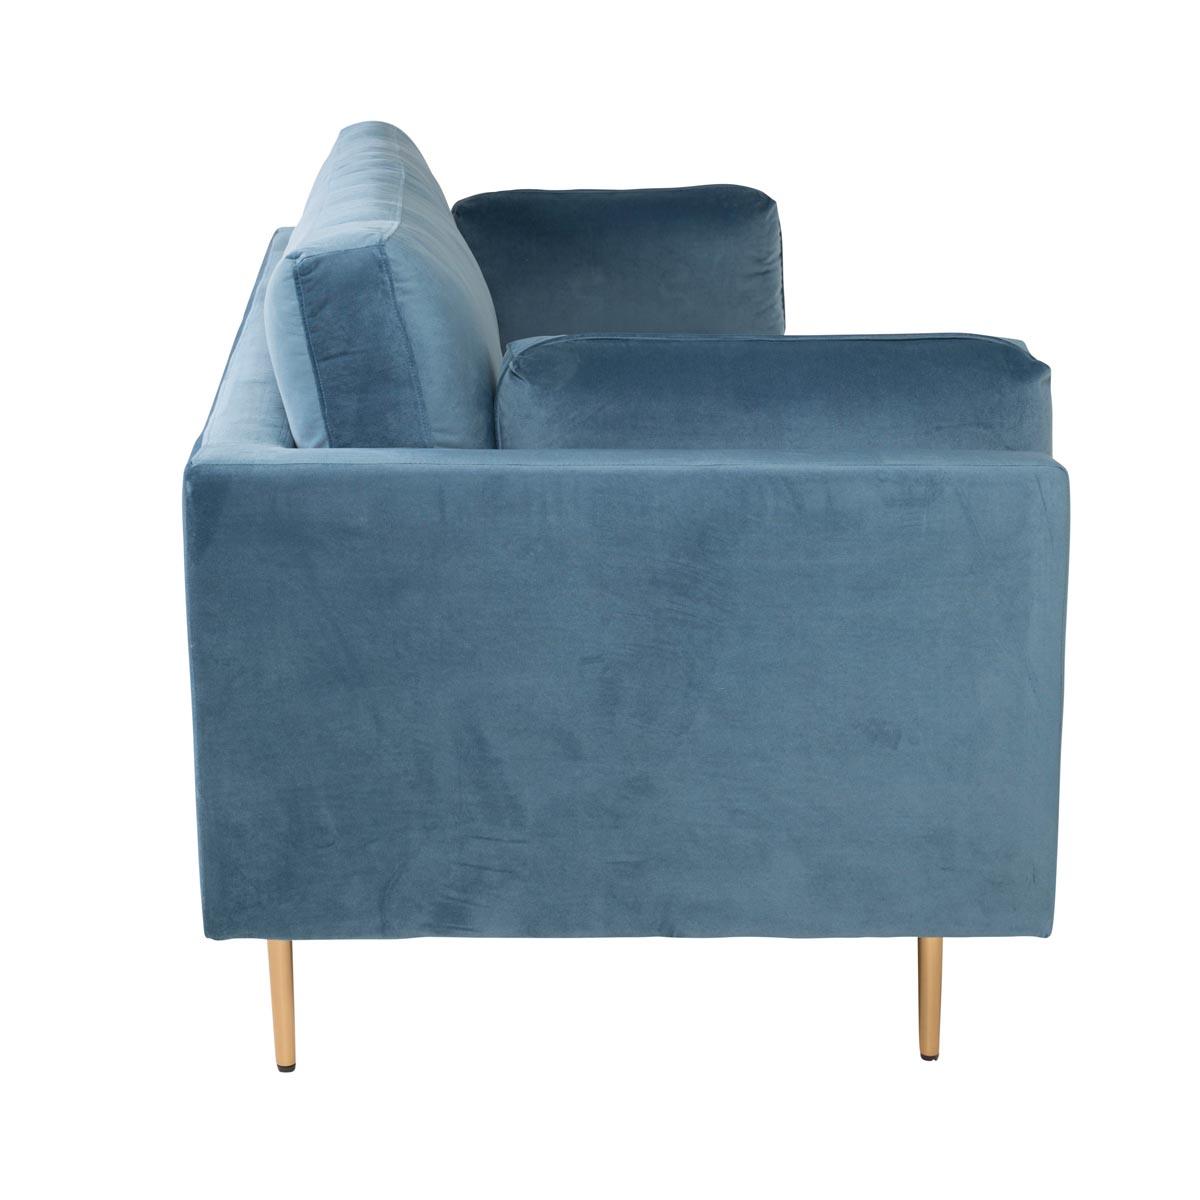 Boom-3-sits-soffa-bla-sammet-sida-18045-987